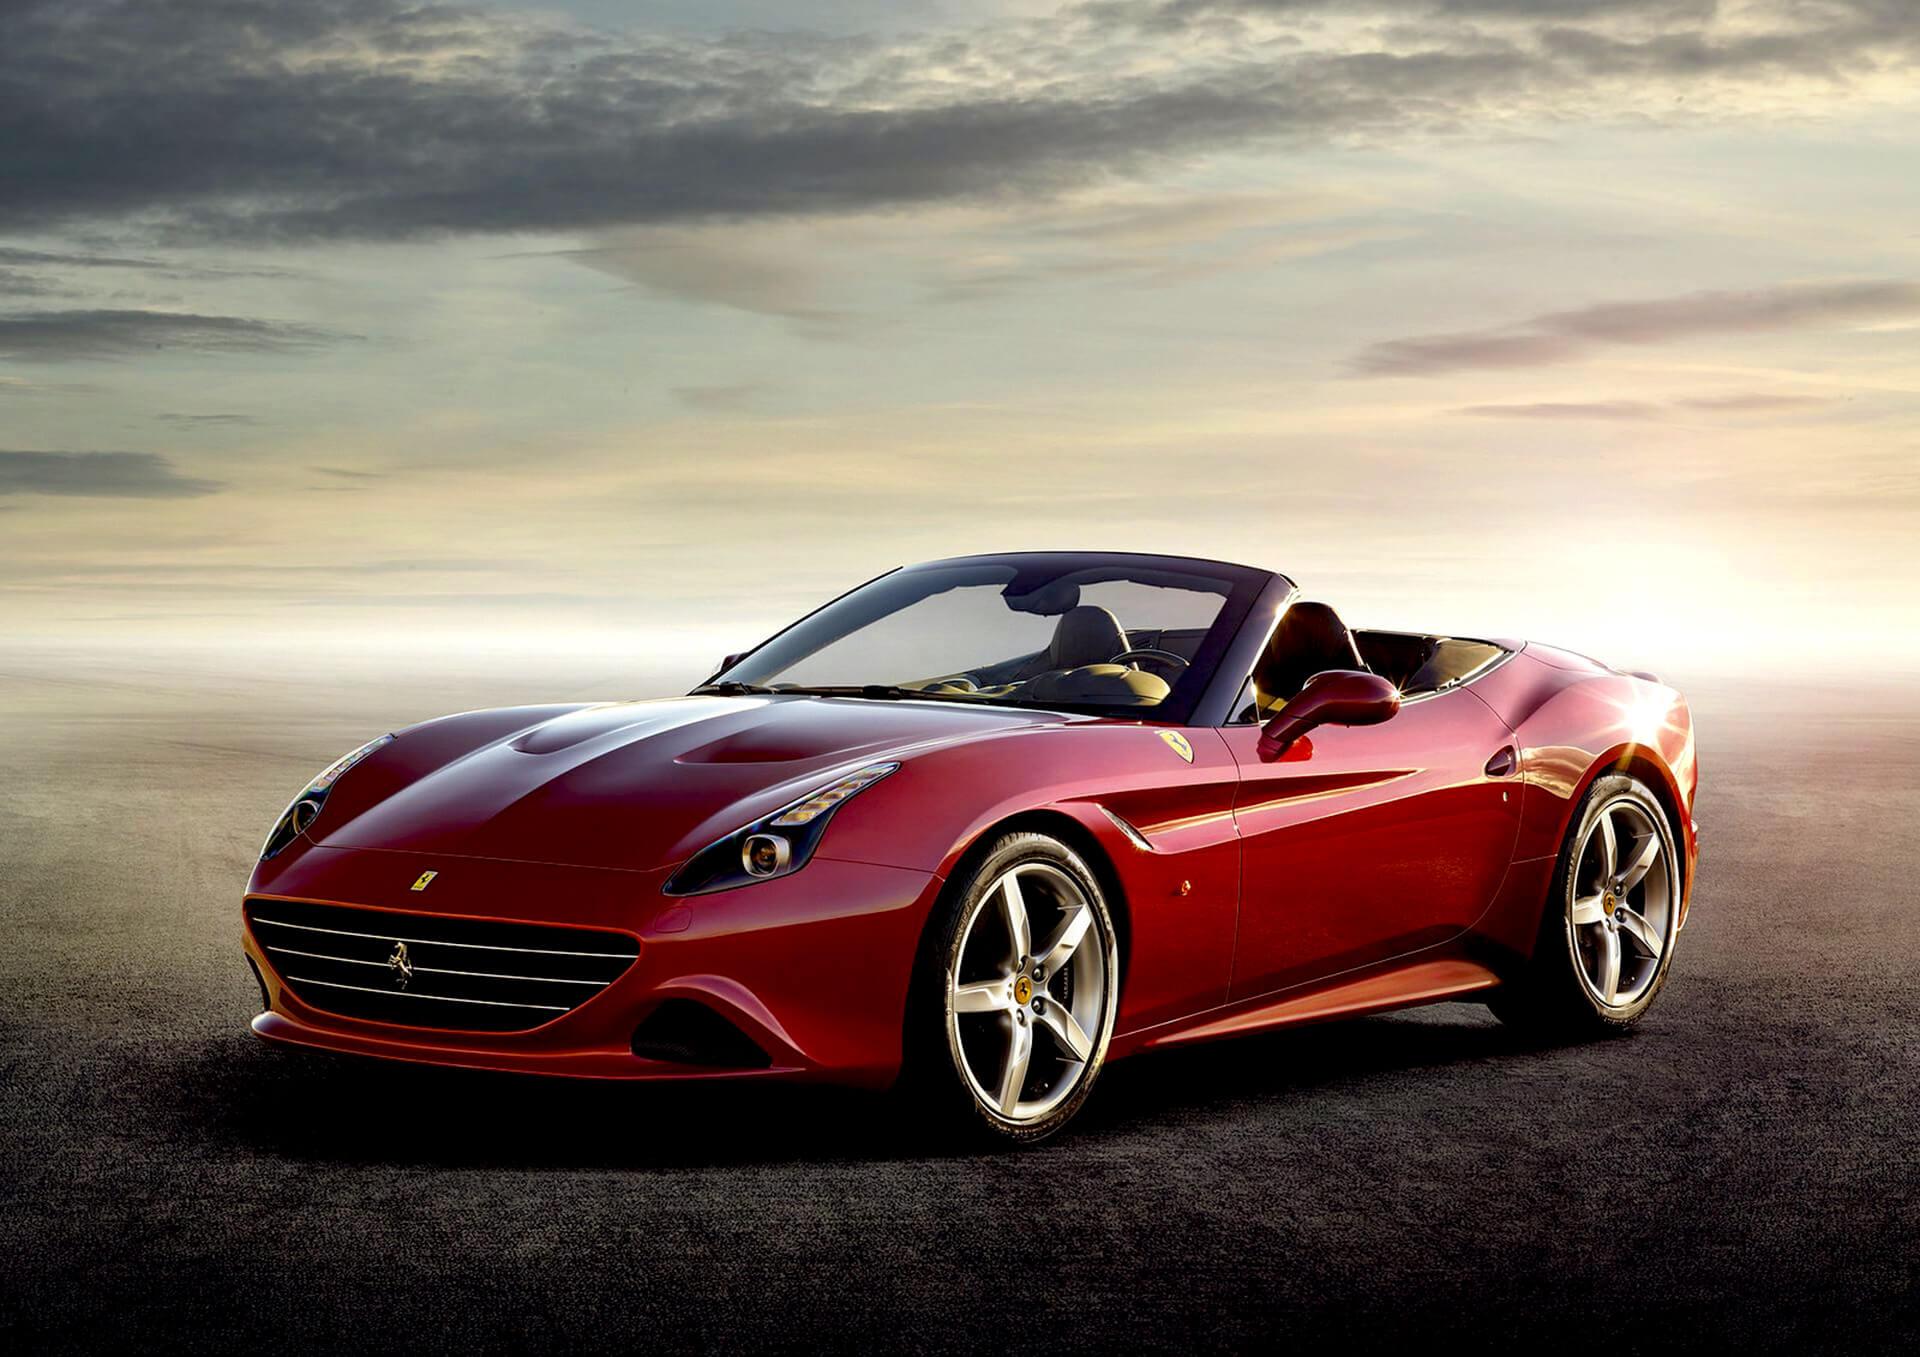 samochod-roku-playboya - Ferrari California T